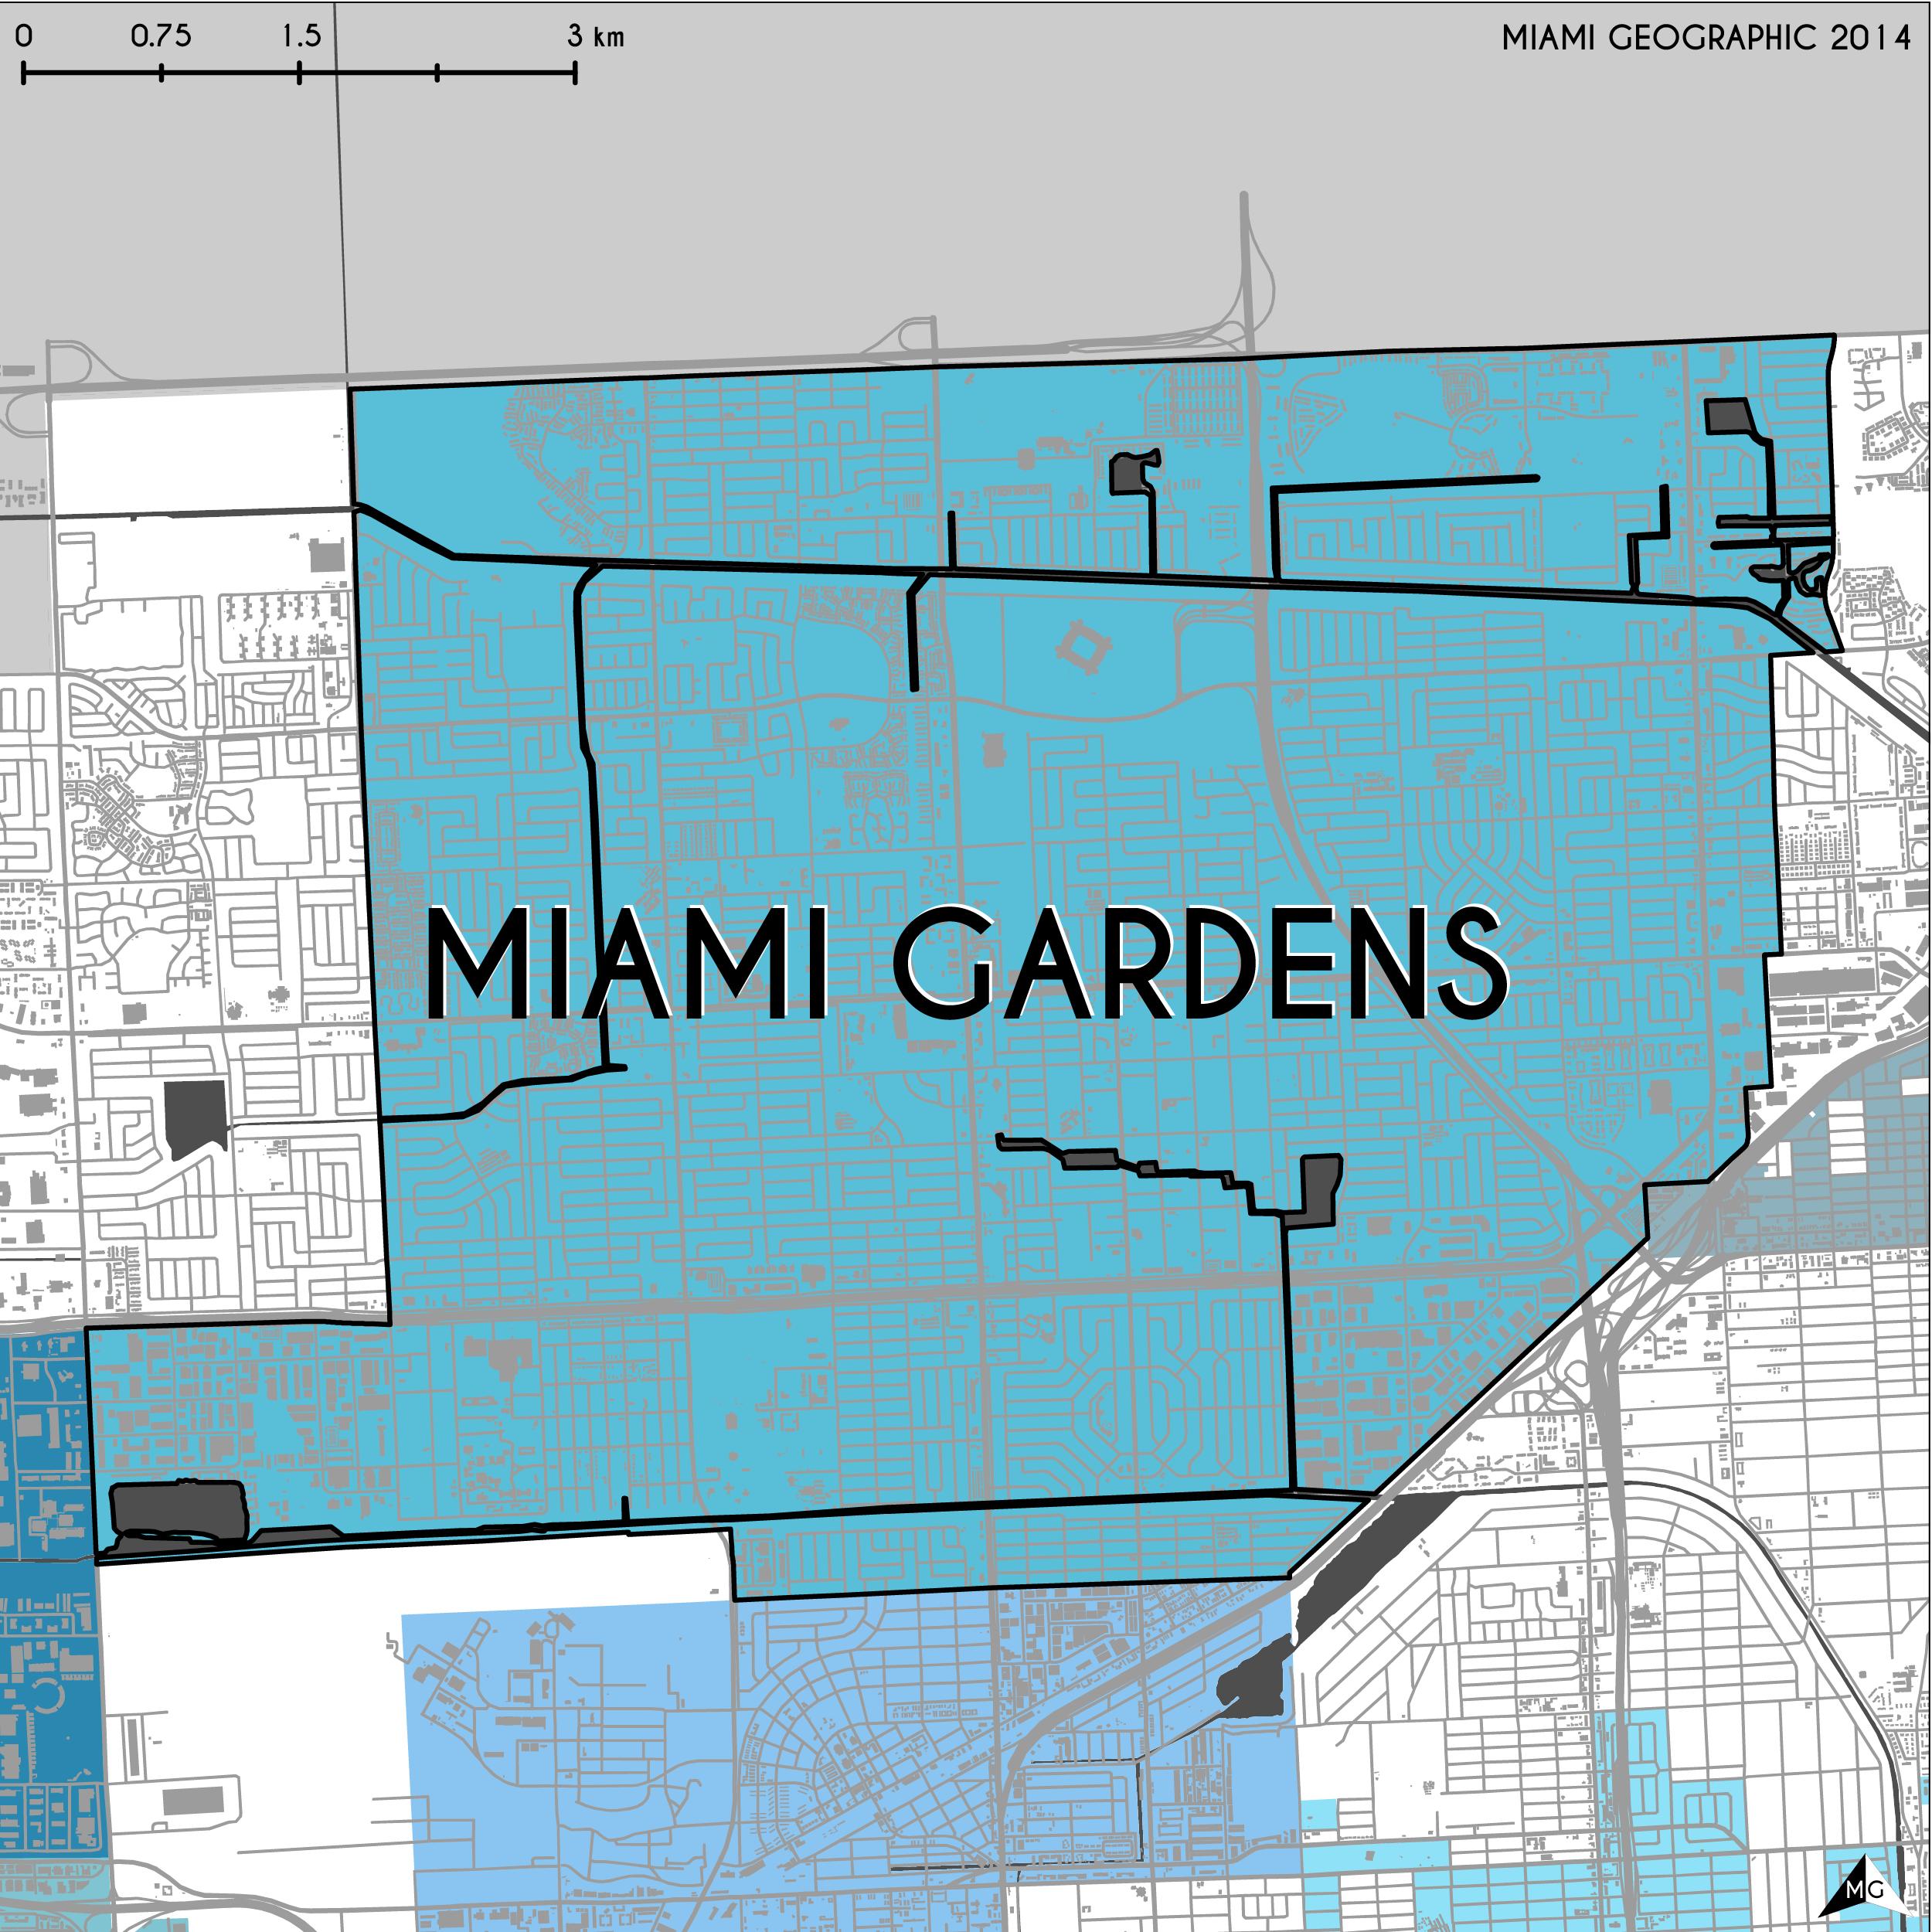 Maps Municipalities of MiamiDade County Miami Geographic